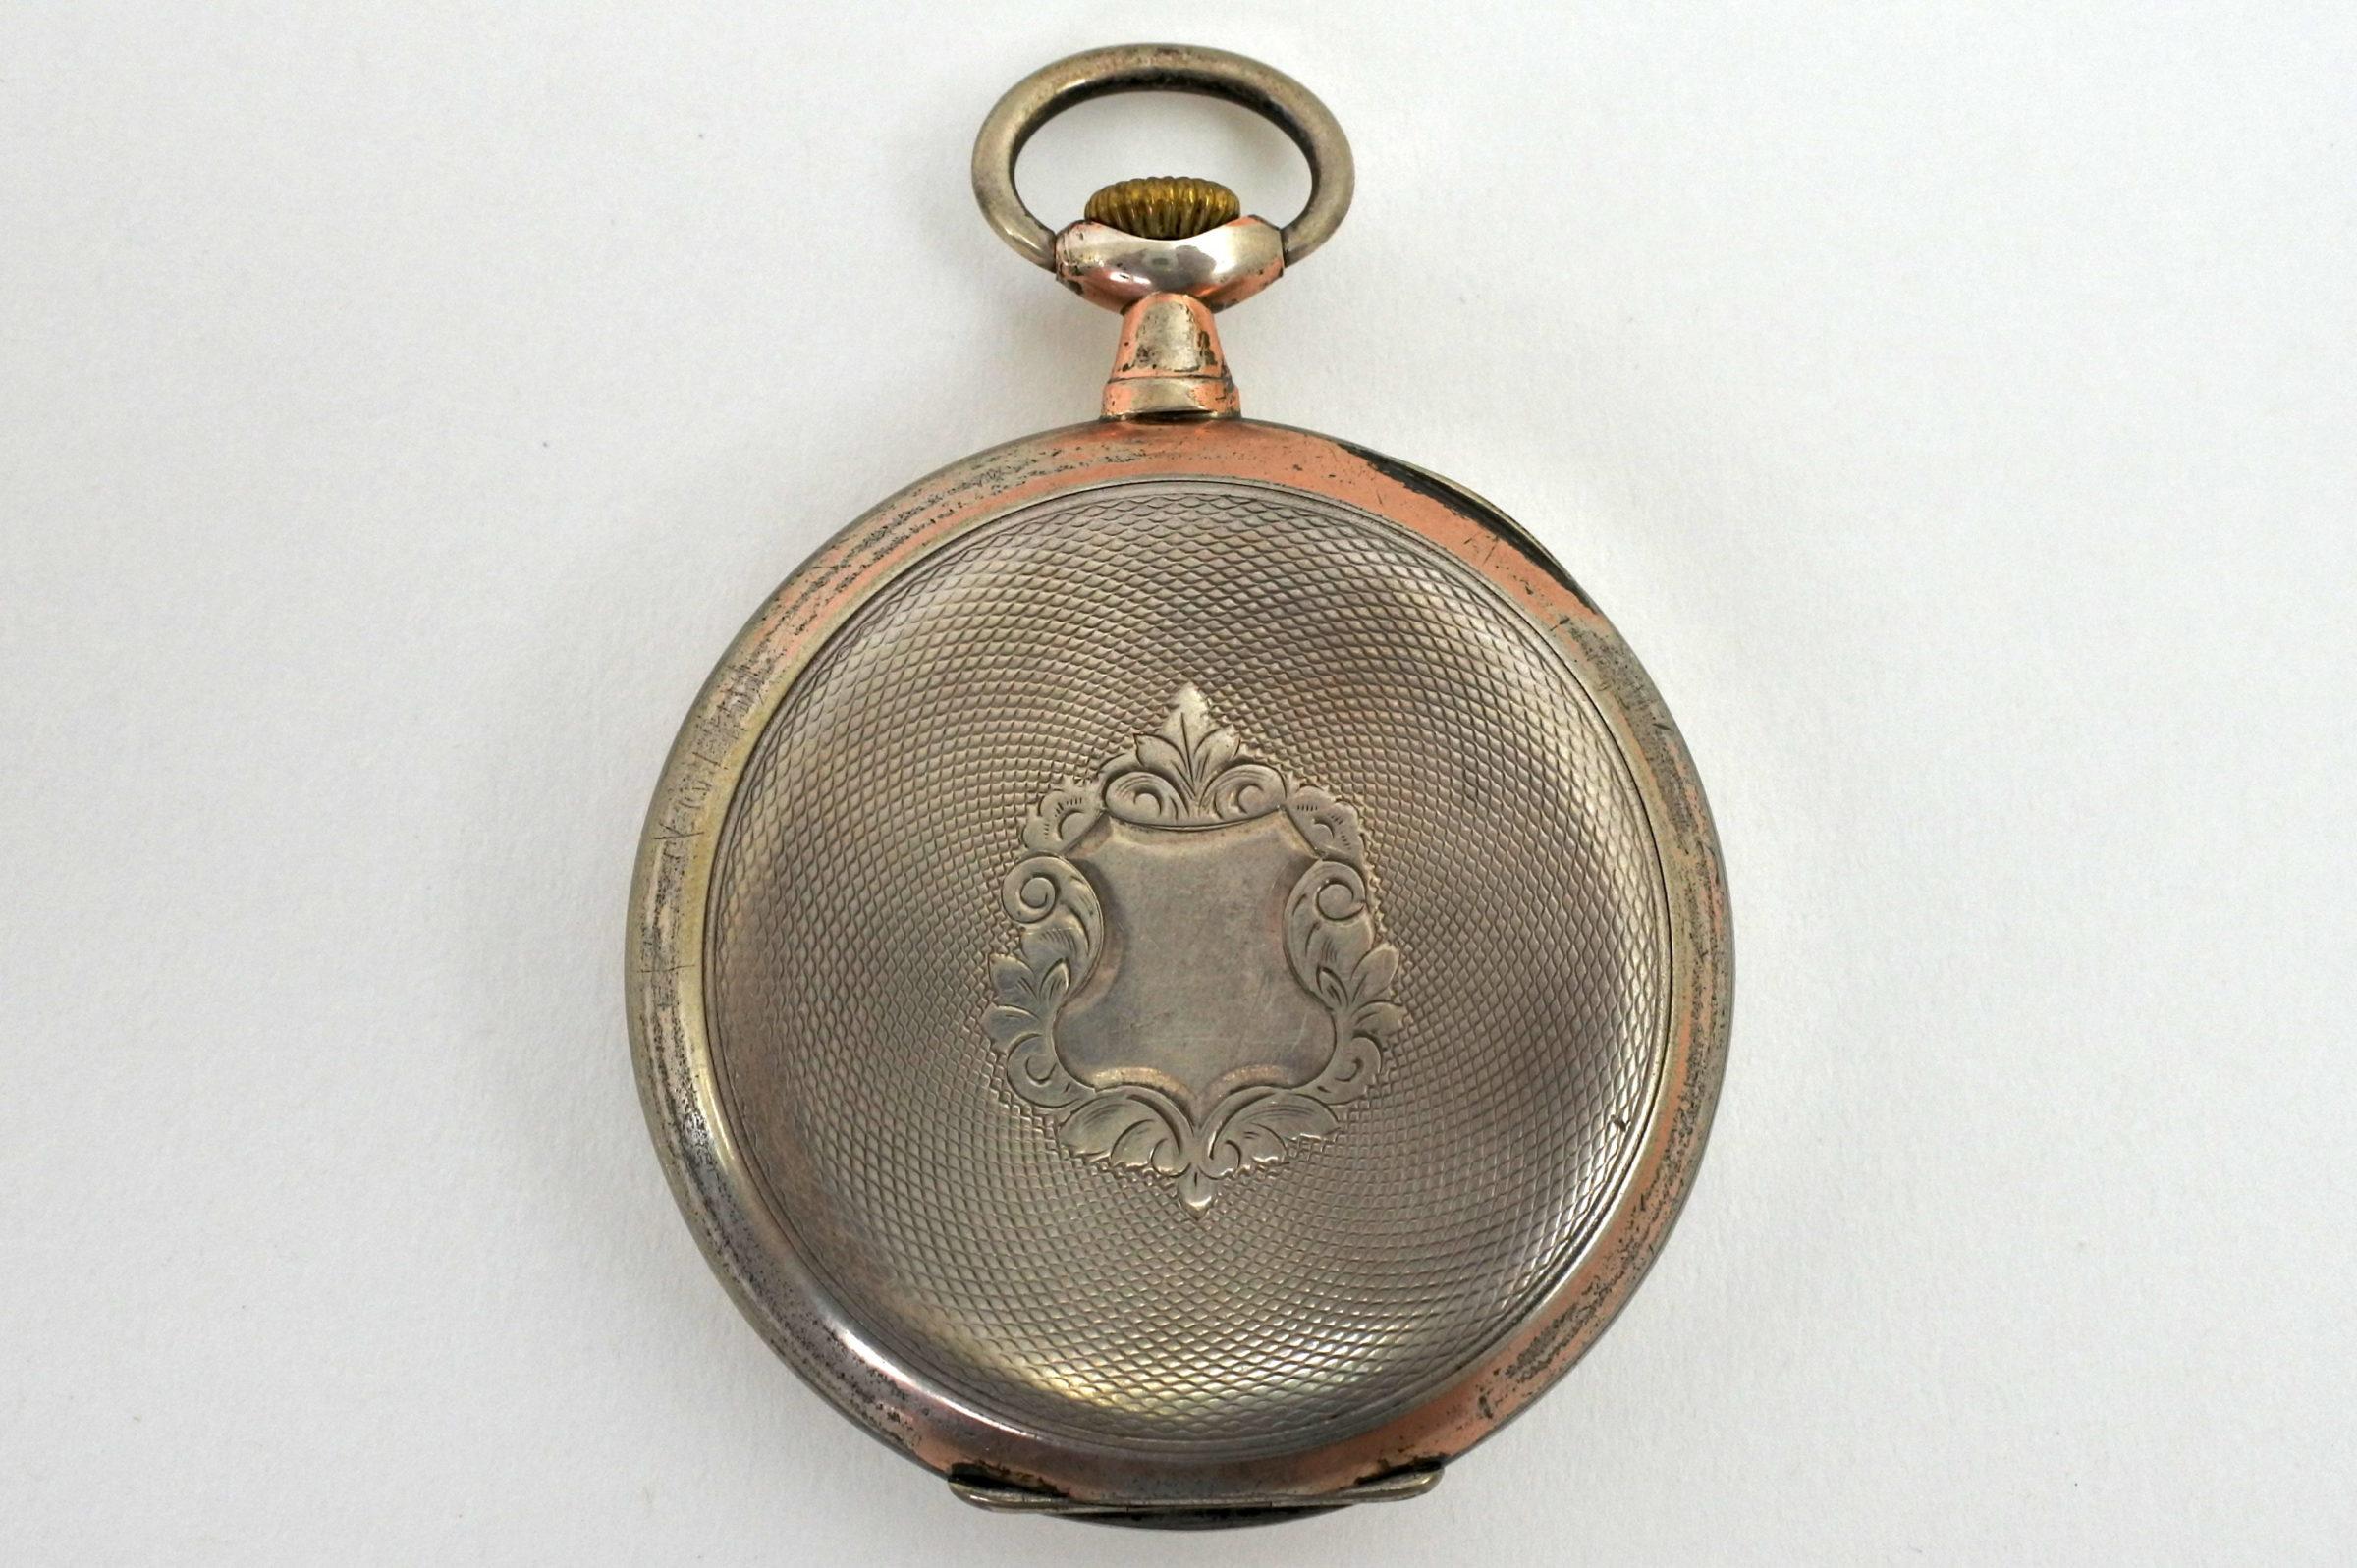 Orologio da tasca in argento – Arcadia - 5